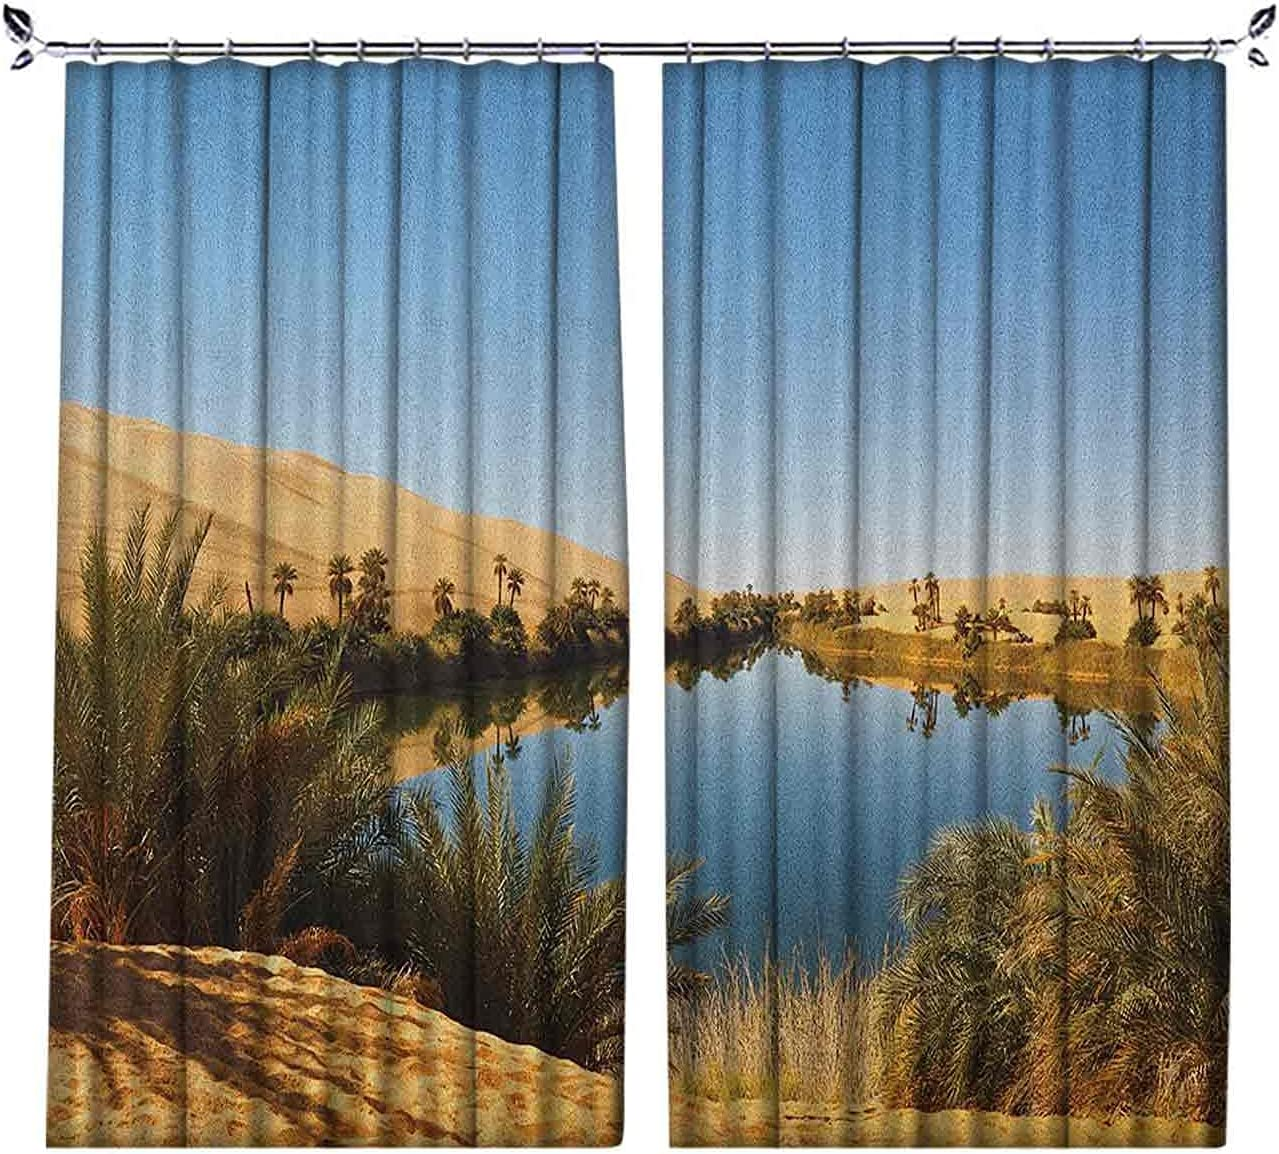 90% cortinas opacas del desierto, Idyllic Oasis Awbari Sand Sea Sahara Libia, Estanque árido, cortinas plisadas para dormitorio, sala de estar, W52 x L84 pulgadas, azul pálido, verde arena, marrón